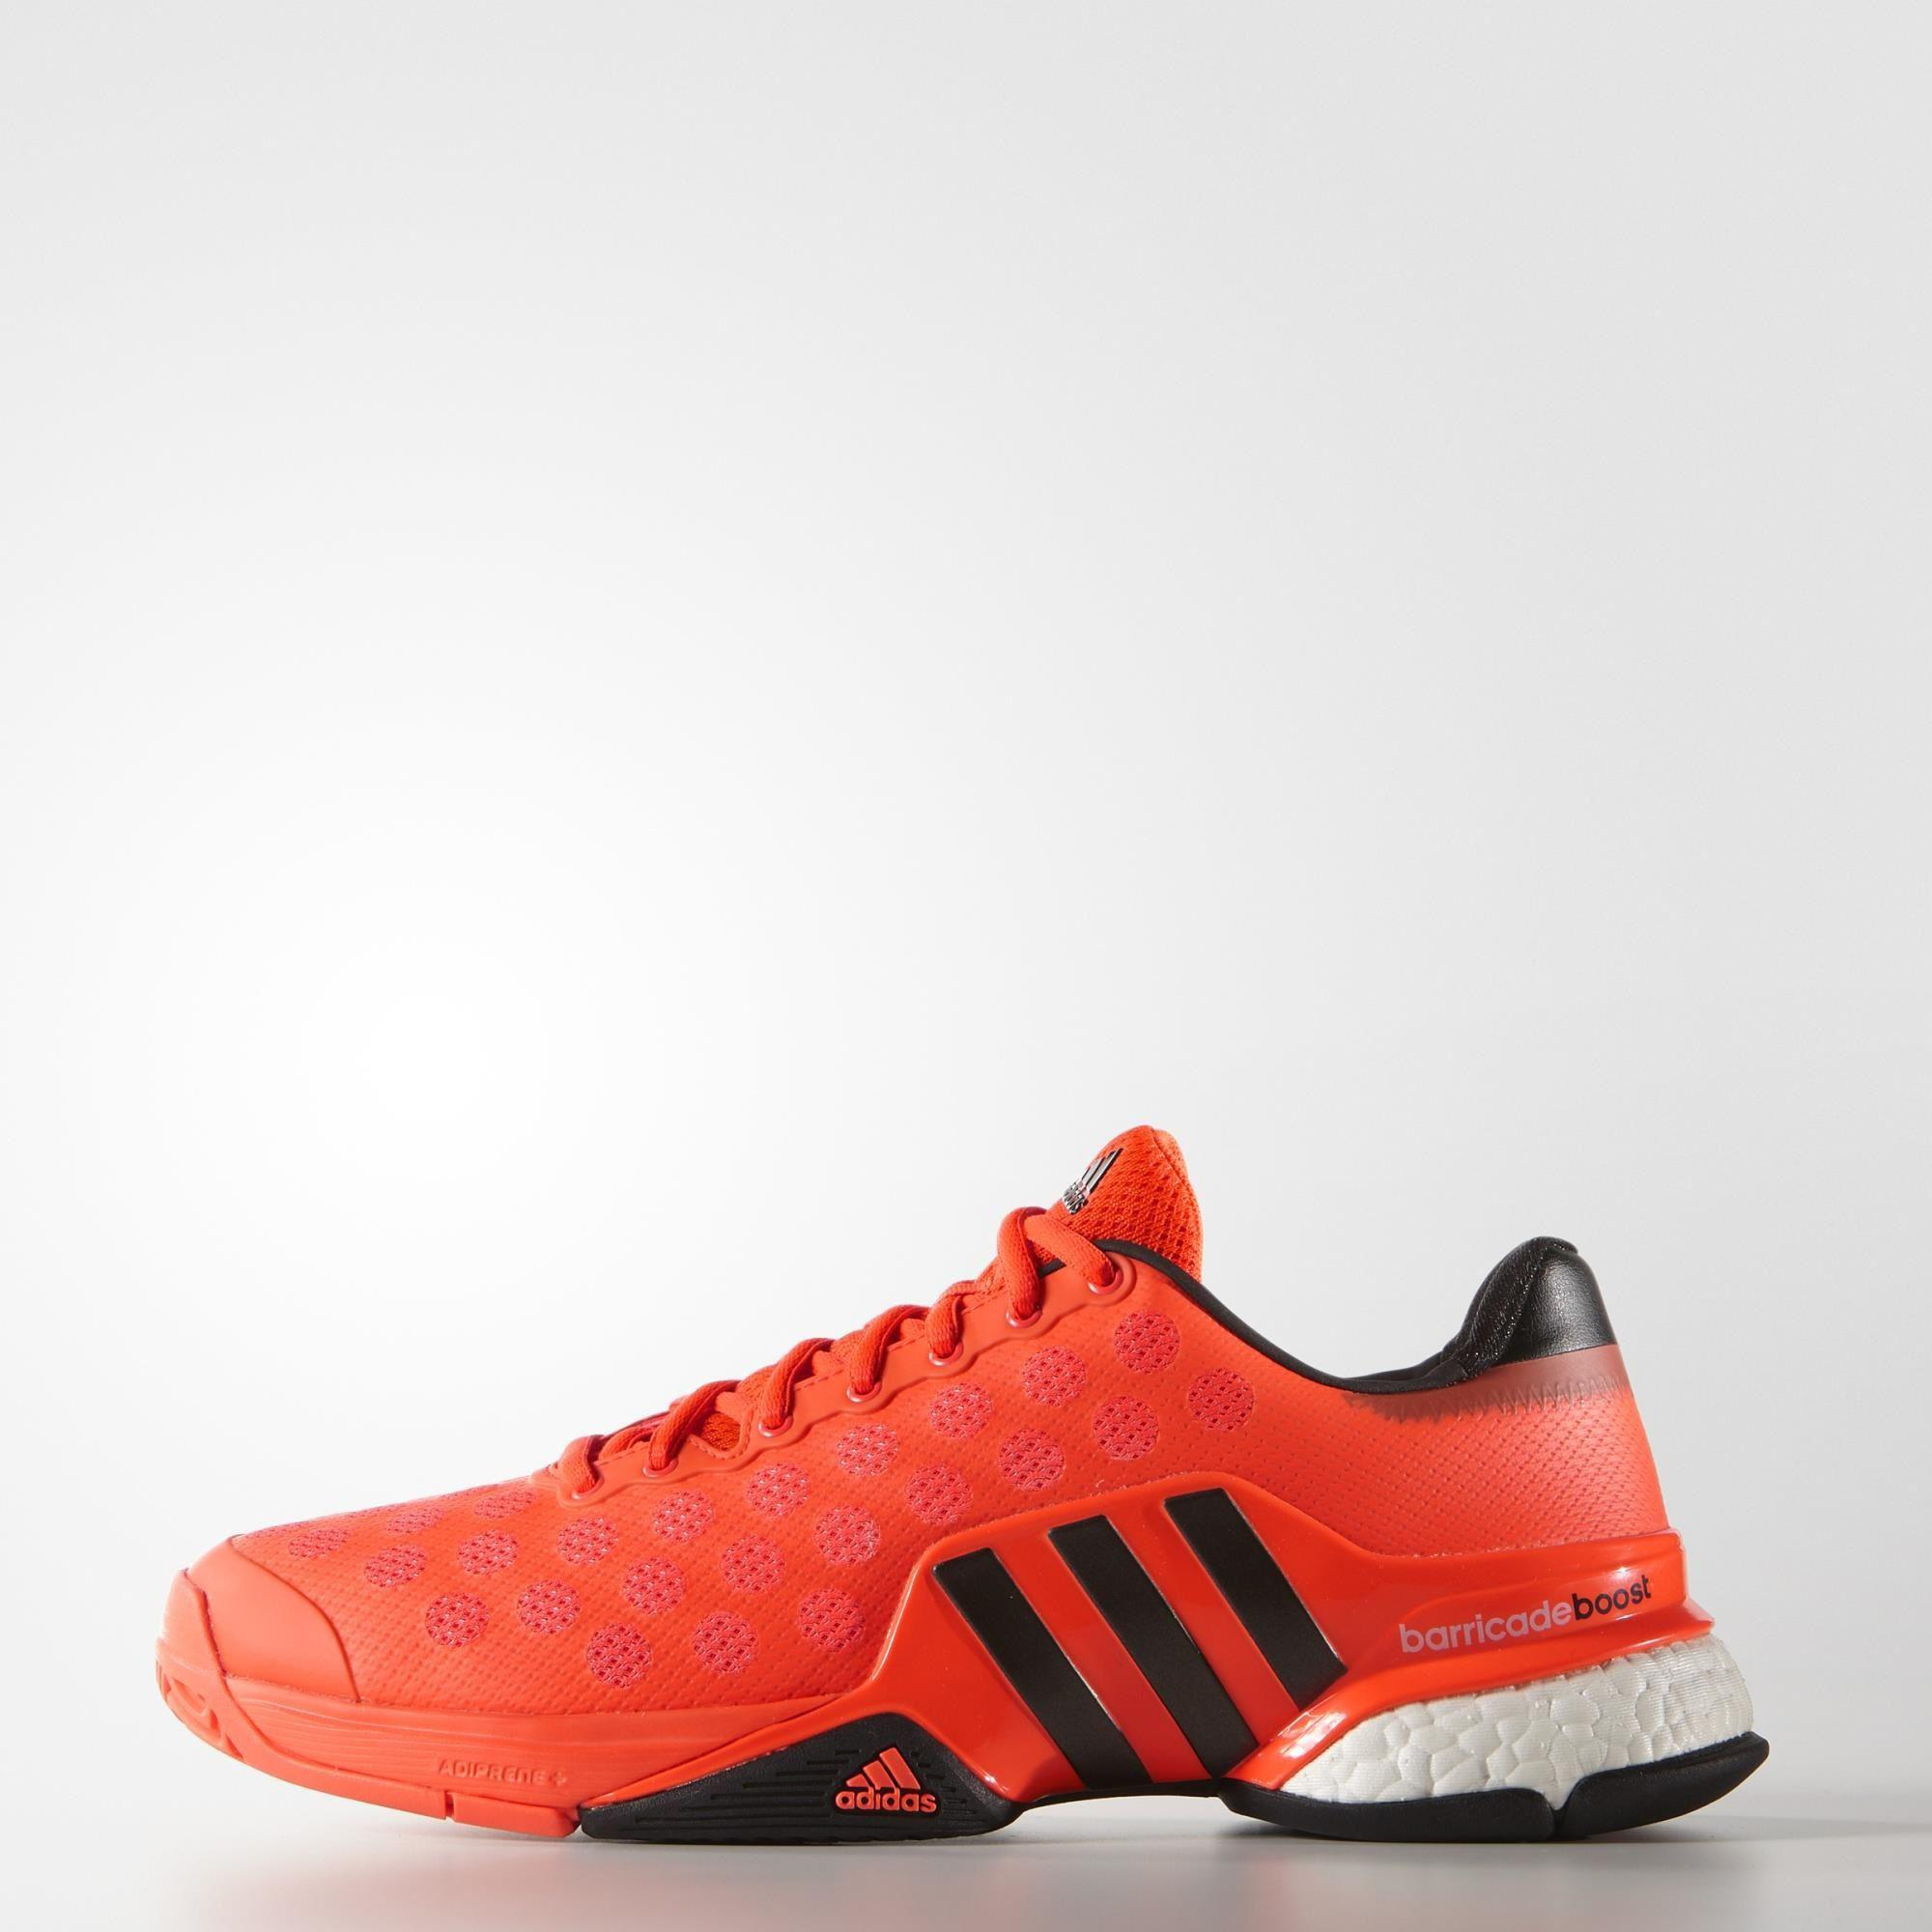 Adidas Mens Limited Edition Barricade